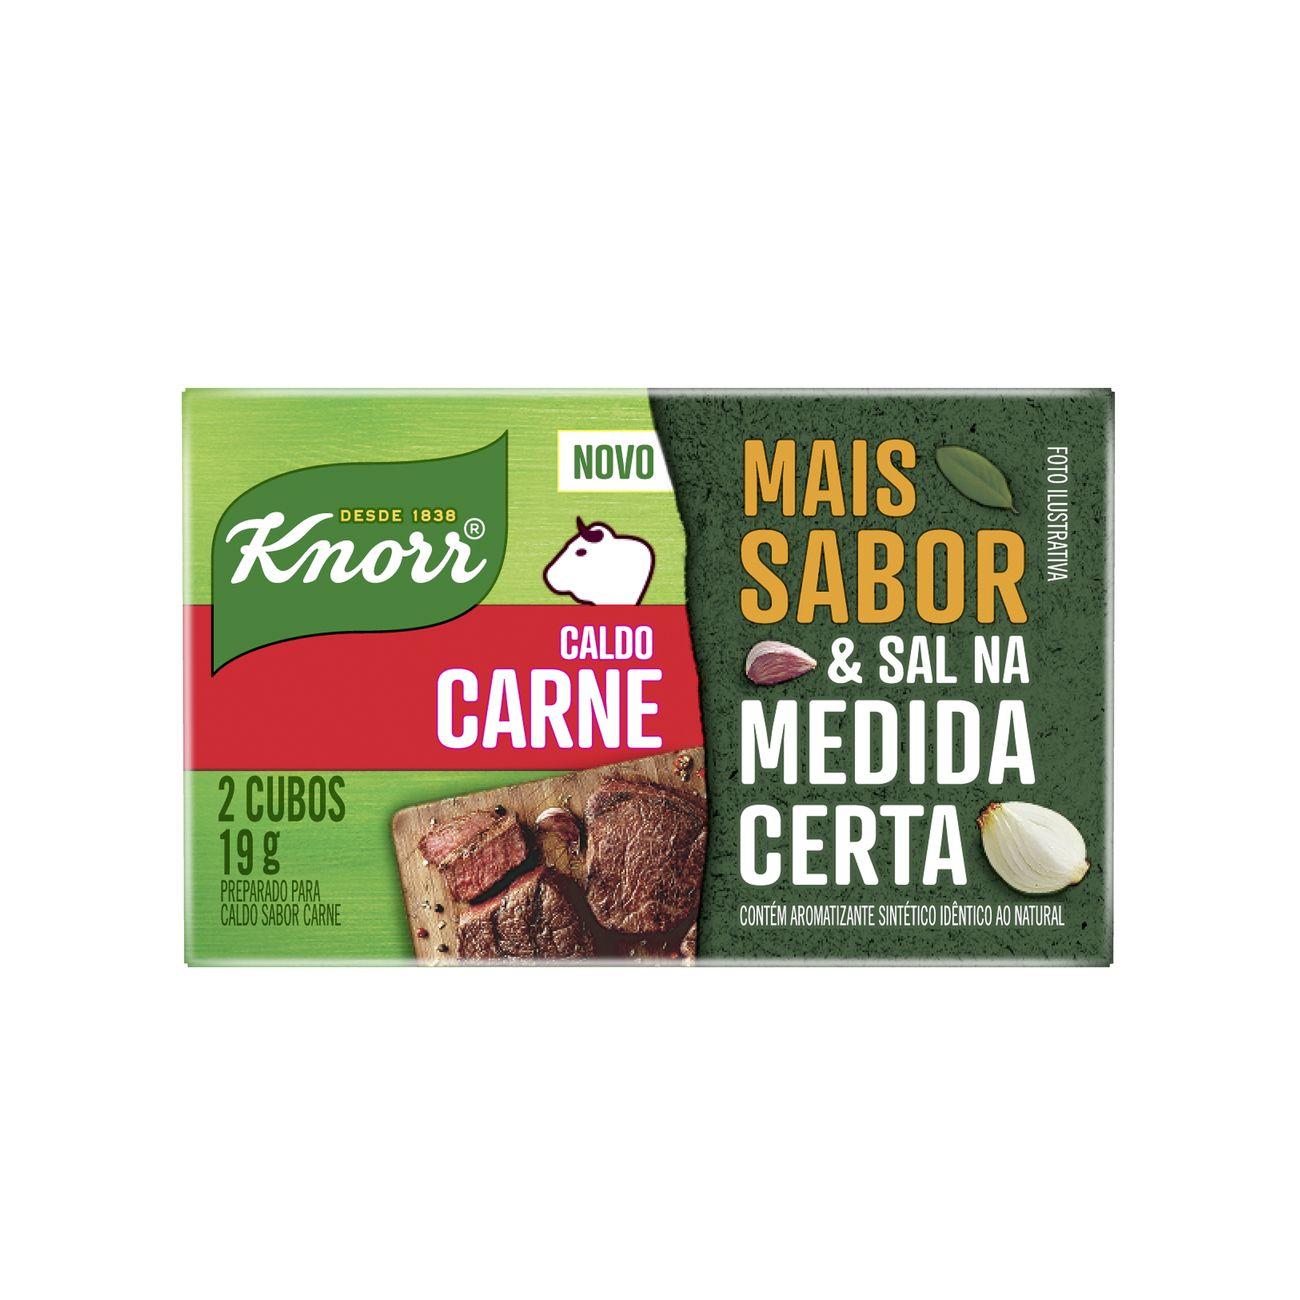 Caldo Knorr Carne 19g